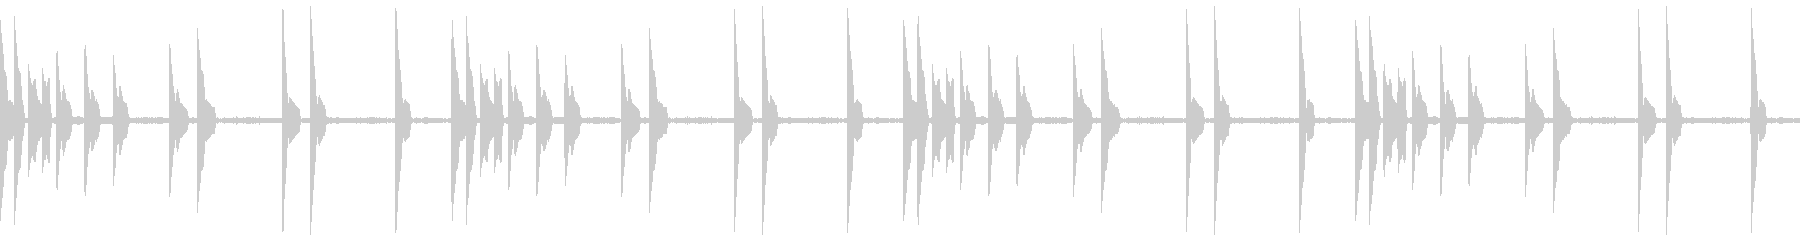 EDM リードシンセ 2 音楽制作用の未再生の波形